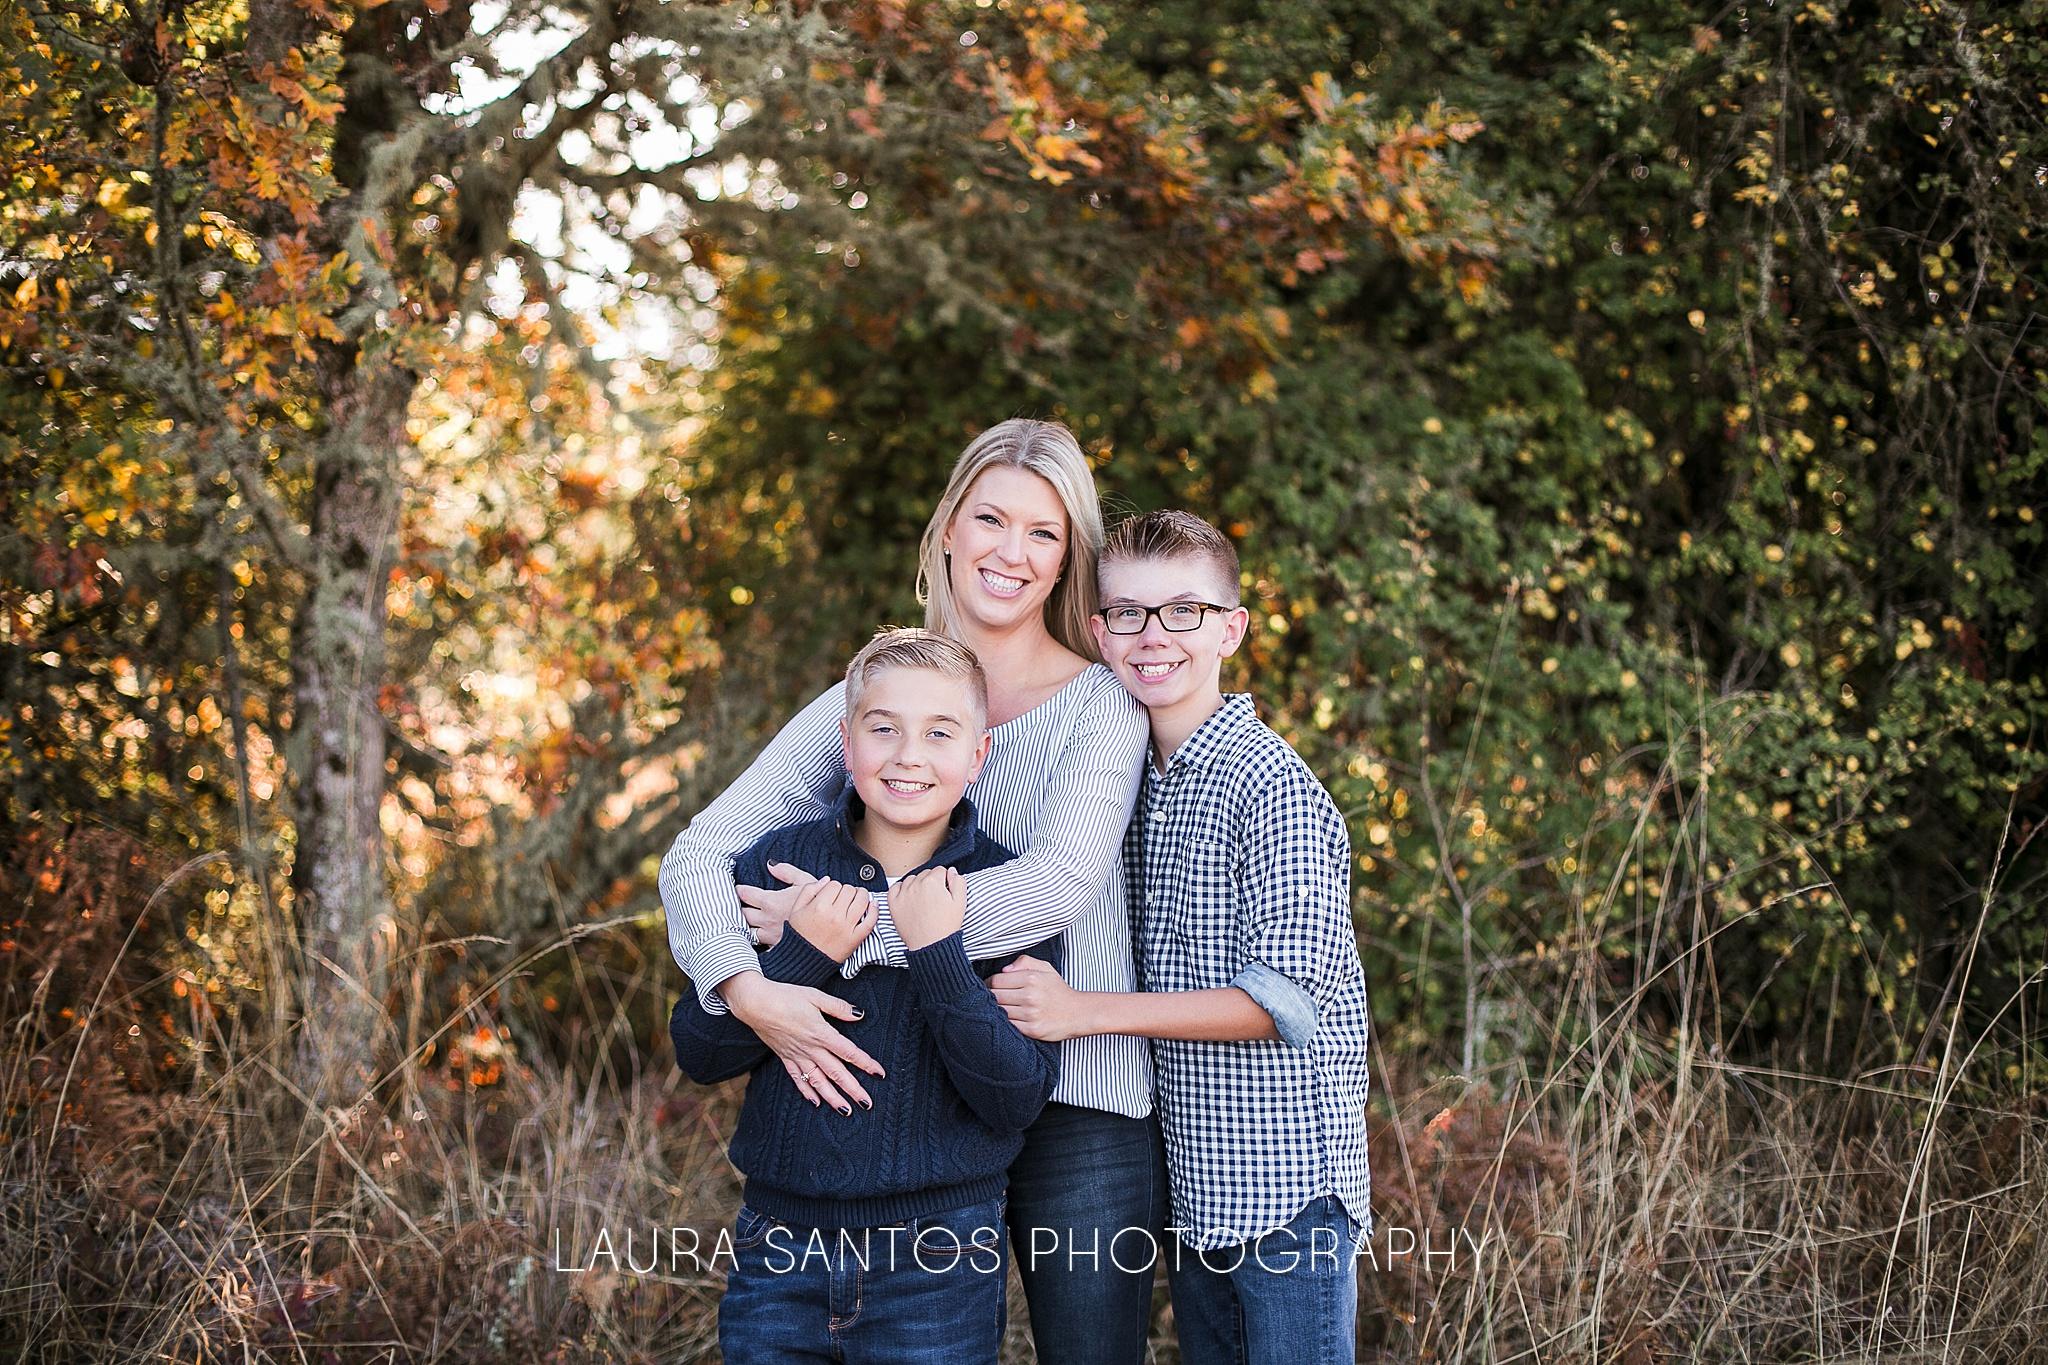 Laura Santos Photography Portland Oregon Family Photographer_0616.jpg